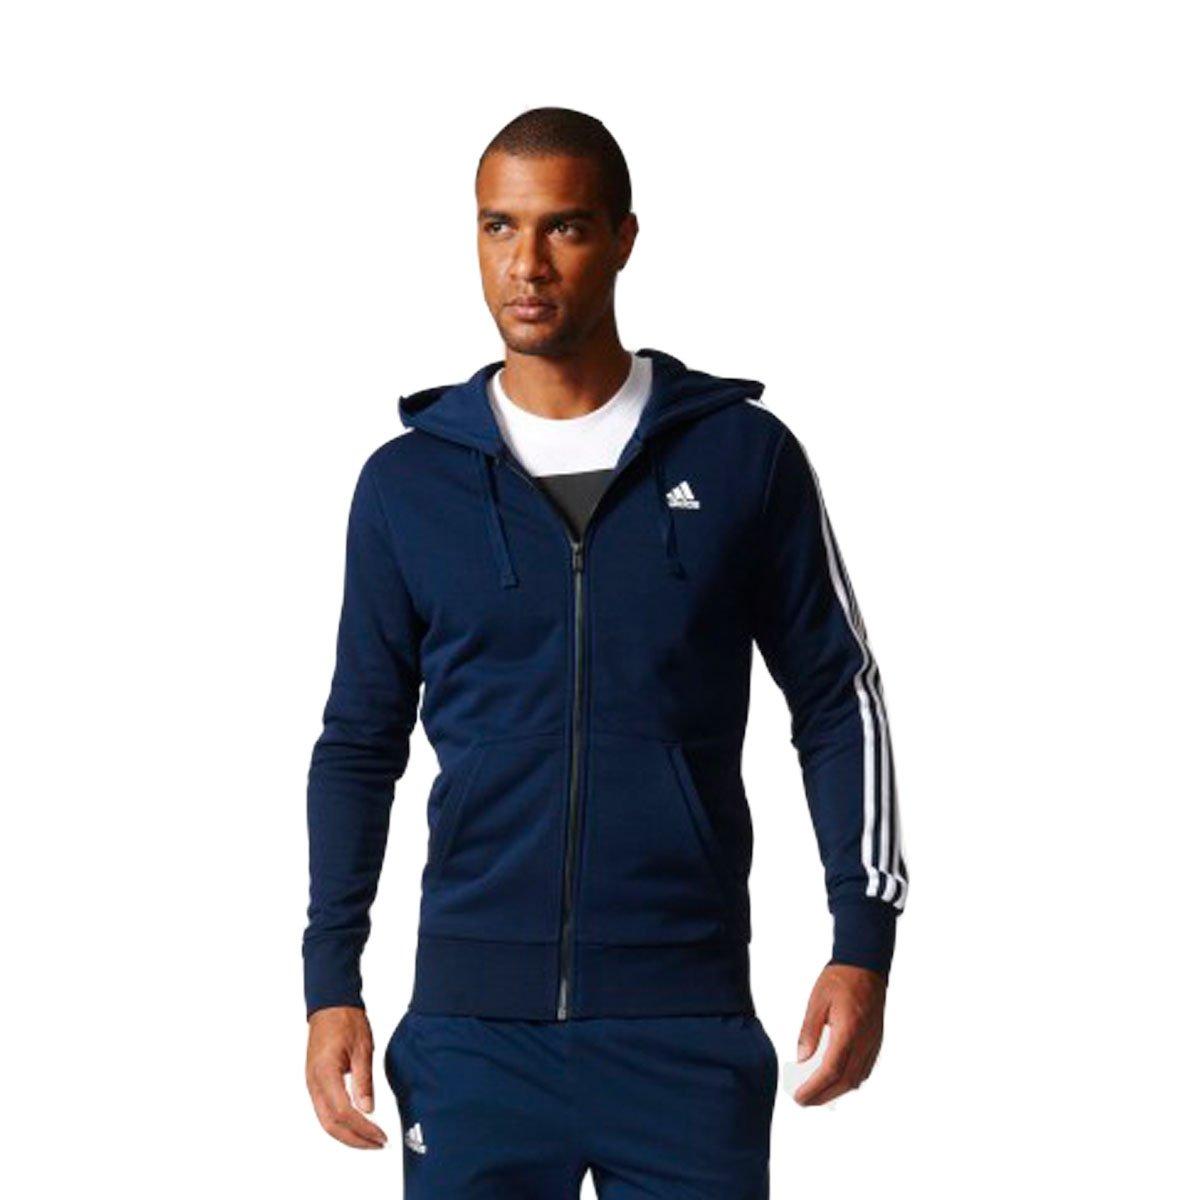 b617ef50061 Bizz Store - Jaqueta Masculina Adidas Essentials 3s FZ Hood